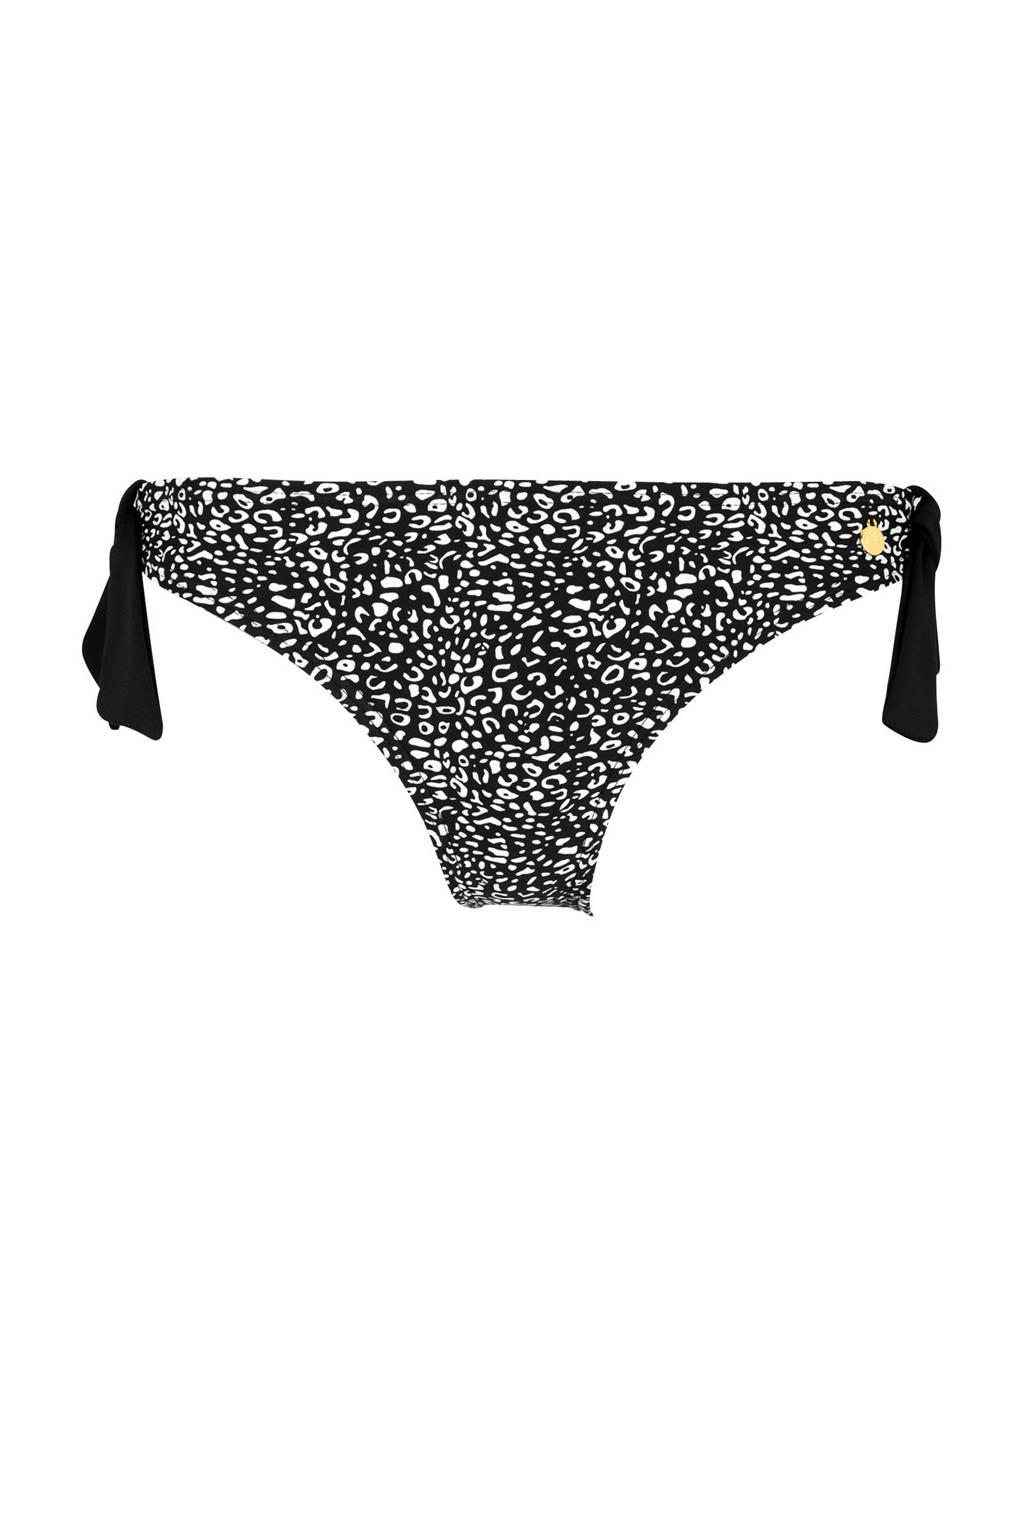 Lascana strik bikinibroekje met all over print zwart/wit, Zwart/wit